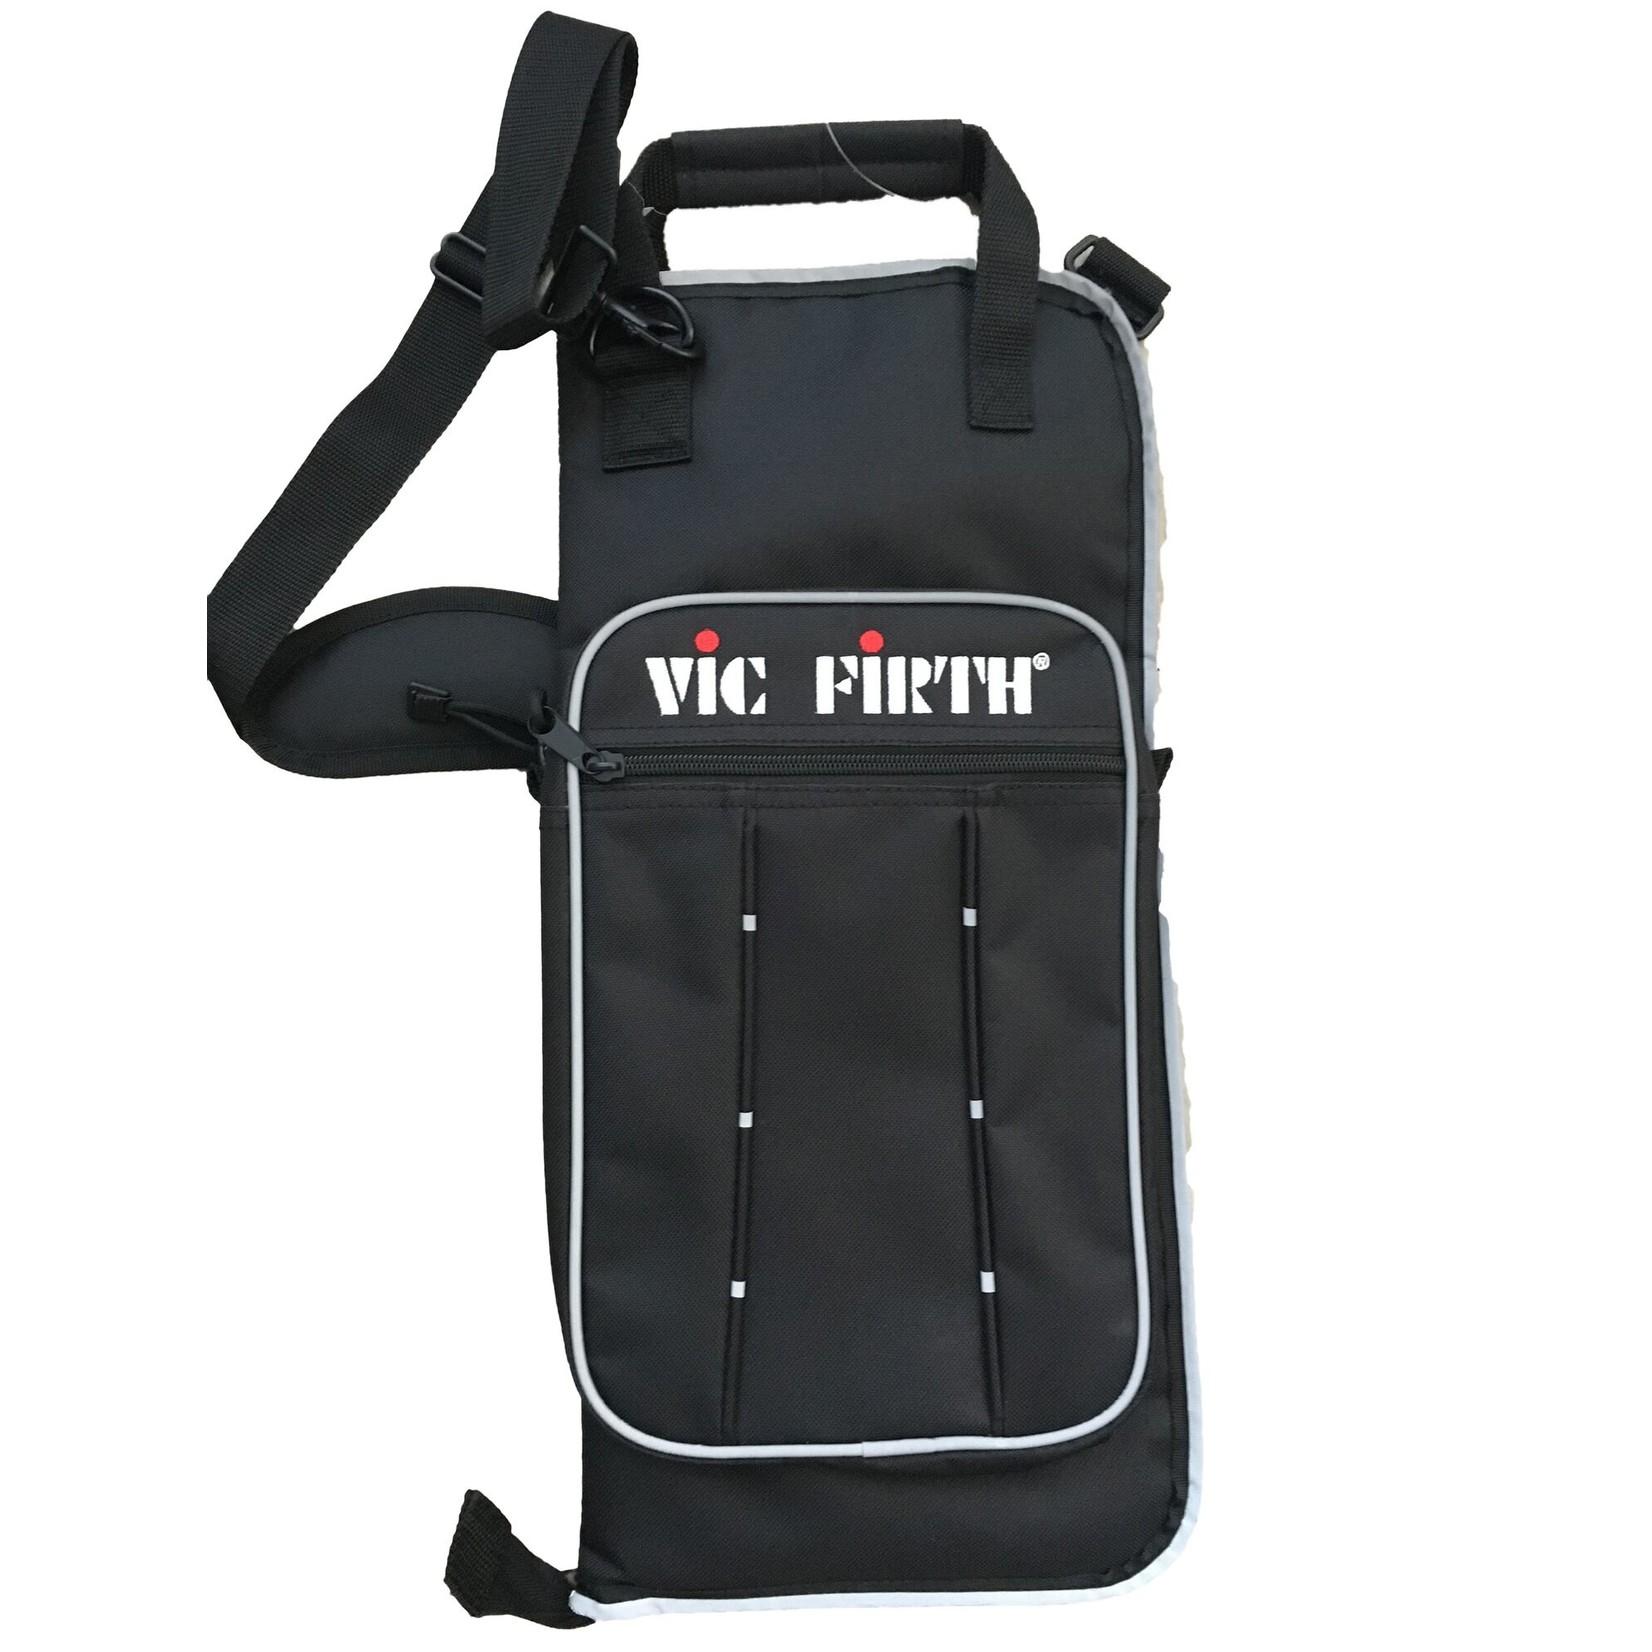 Vic Firth Vic Firth Classic Stick Bag